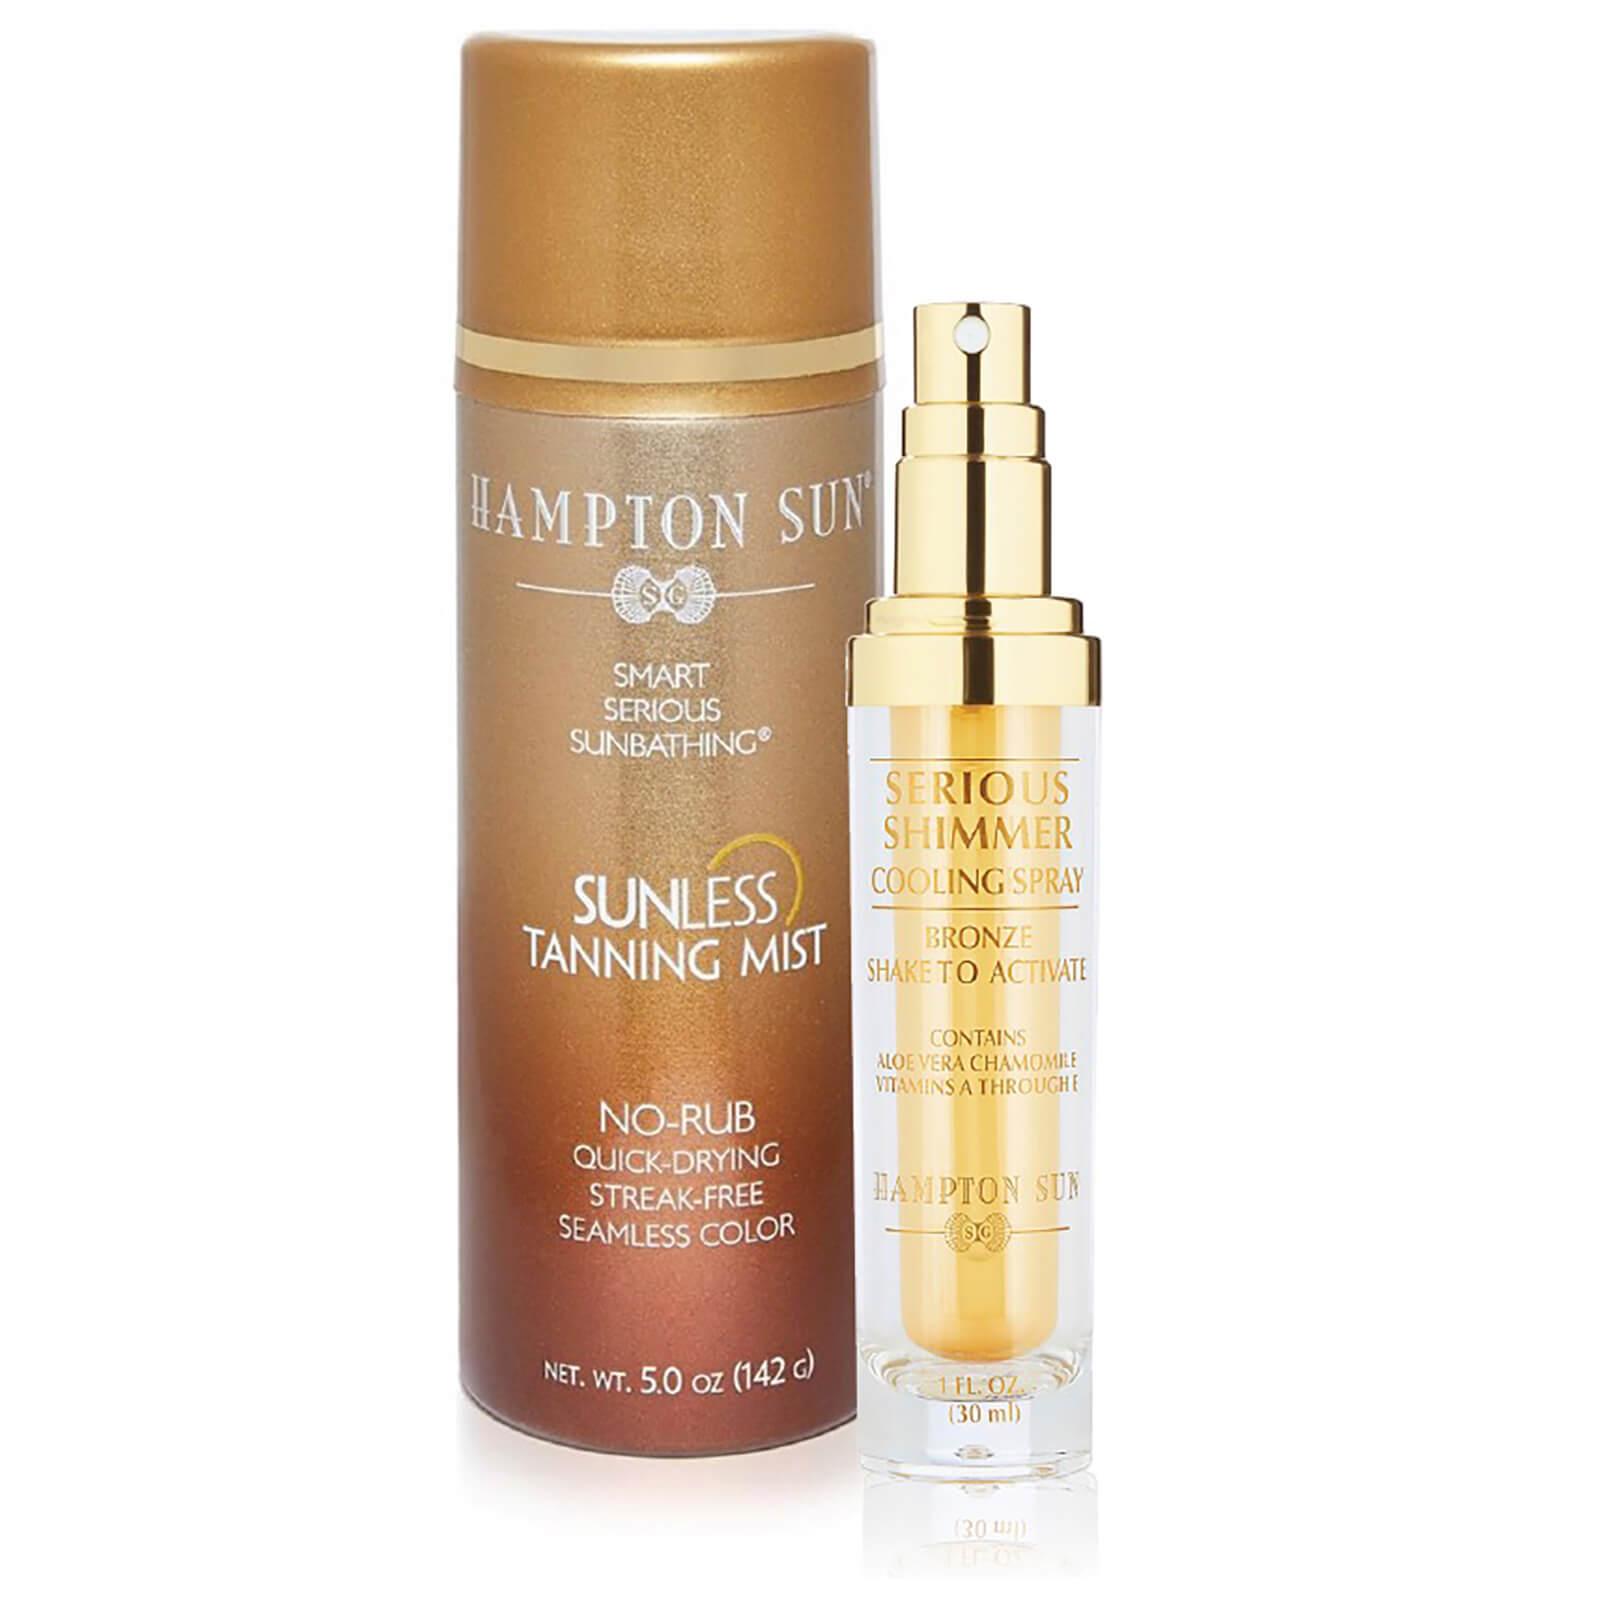 hampton sun sunless tanning mist shimmer bronze duo skinstore